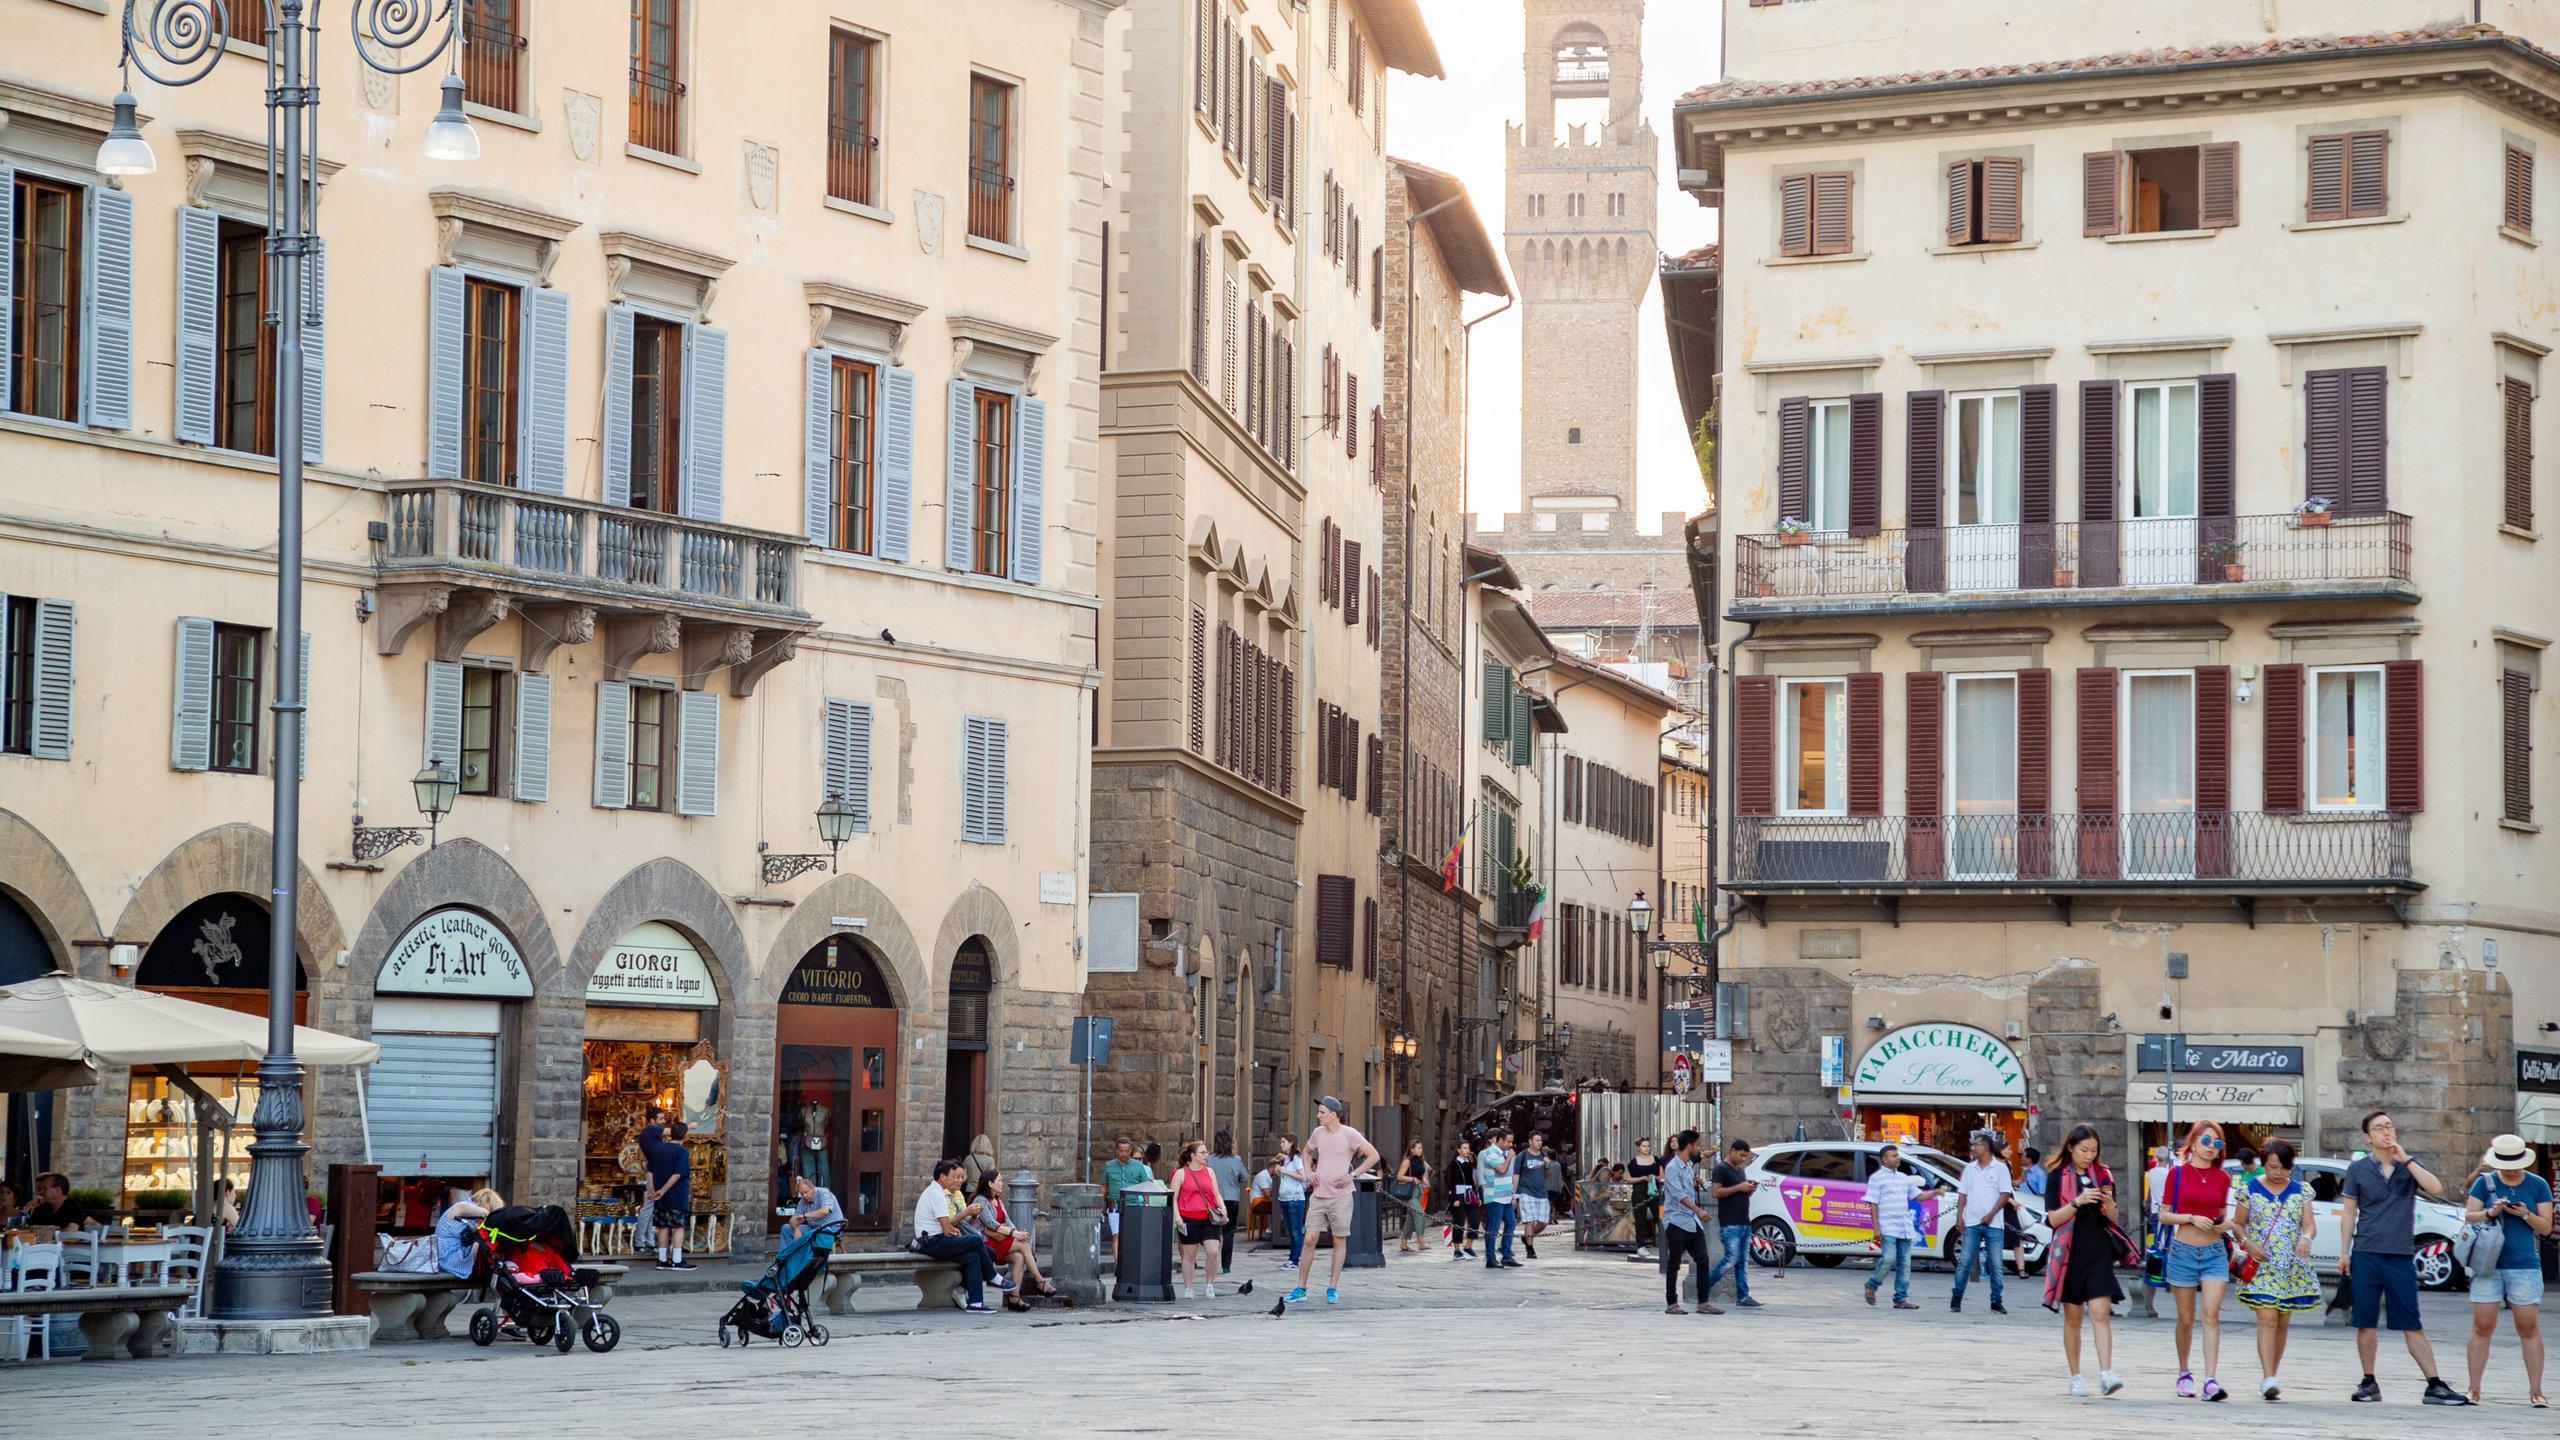 Santa Croce, Florenz, Toskana, Italien